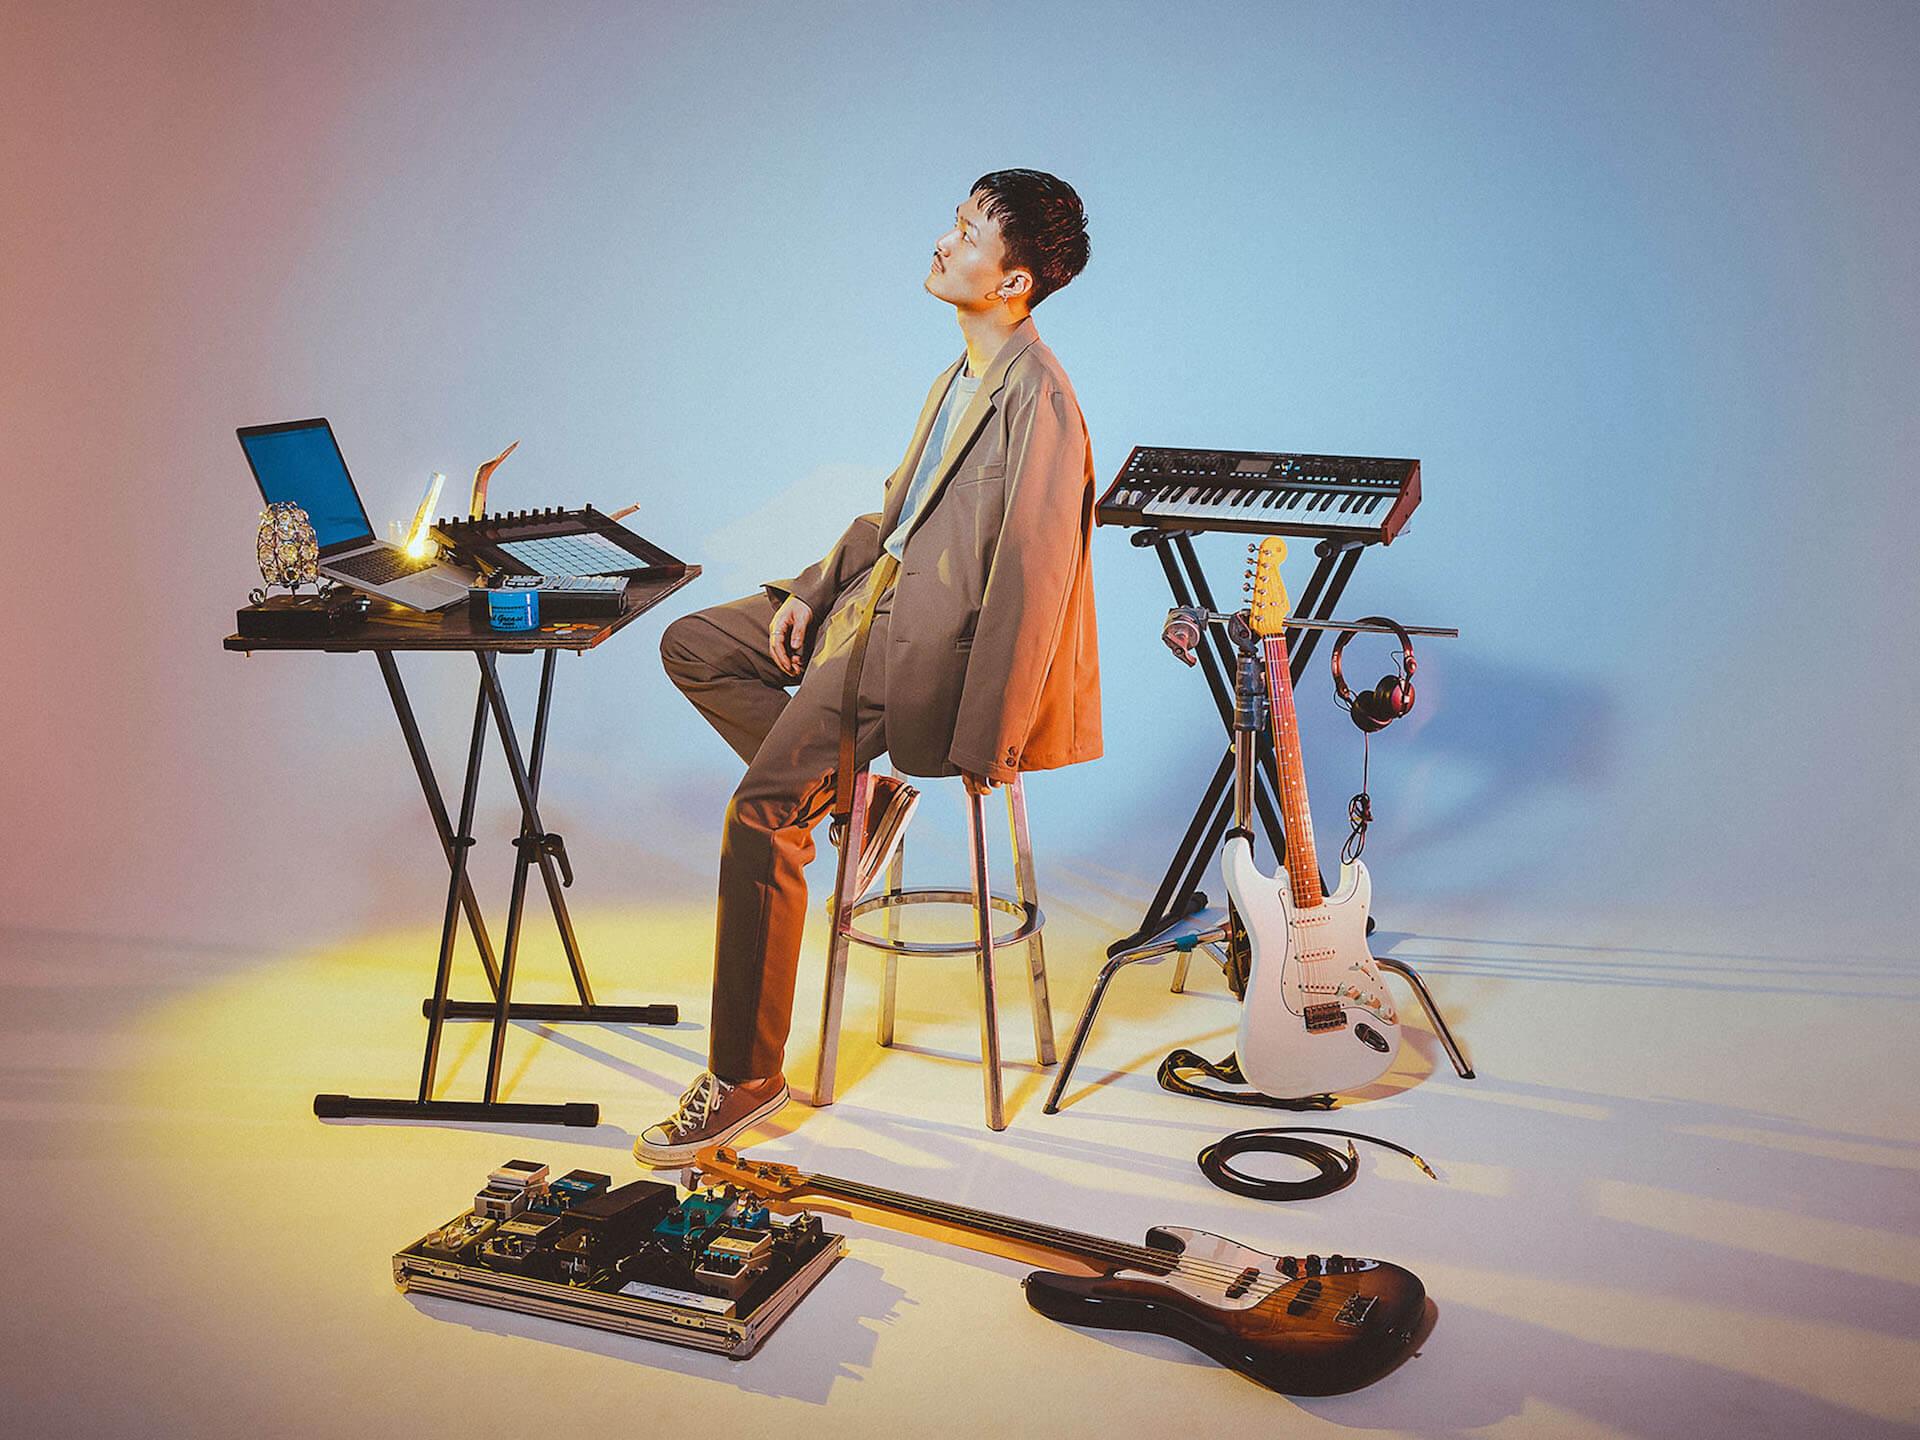 Shin Sakiura、3rdアルバム『NOTE』リリース記念スタジオライブの配信を決定! music200406_shinsakiura_3